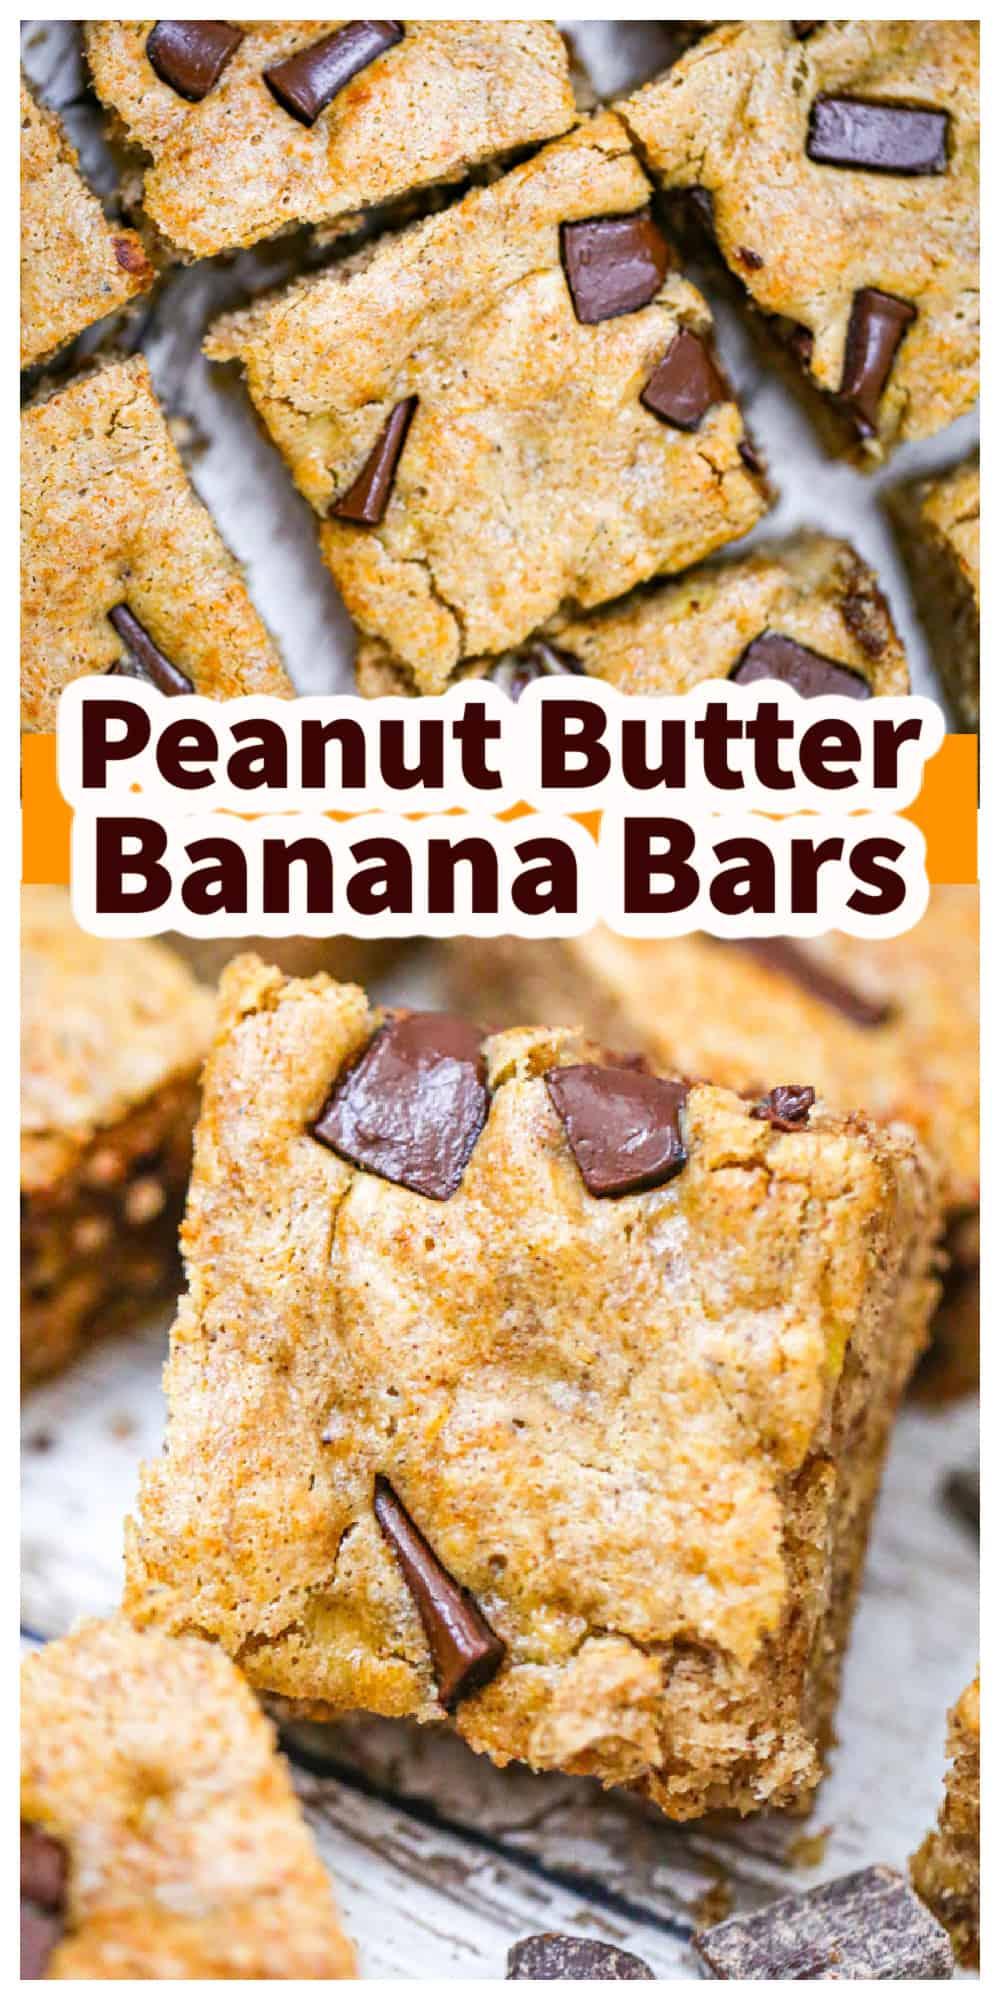 Peanut Butter Banana Bars